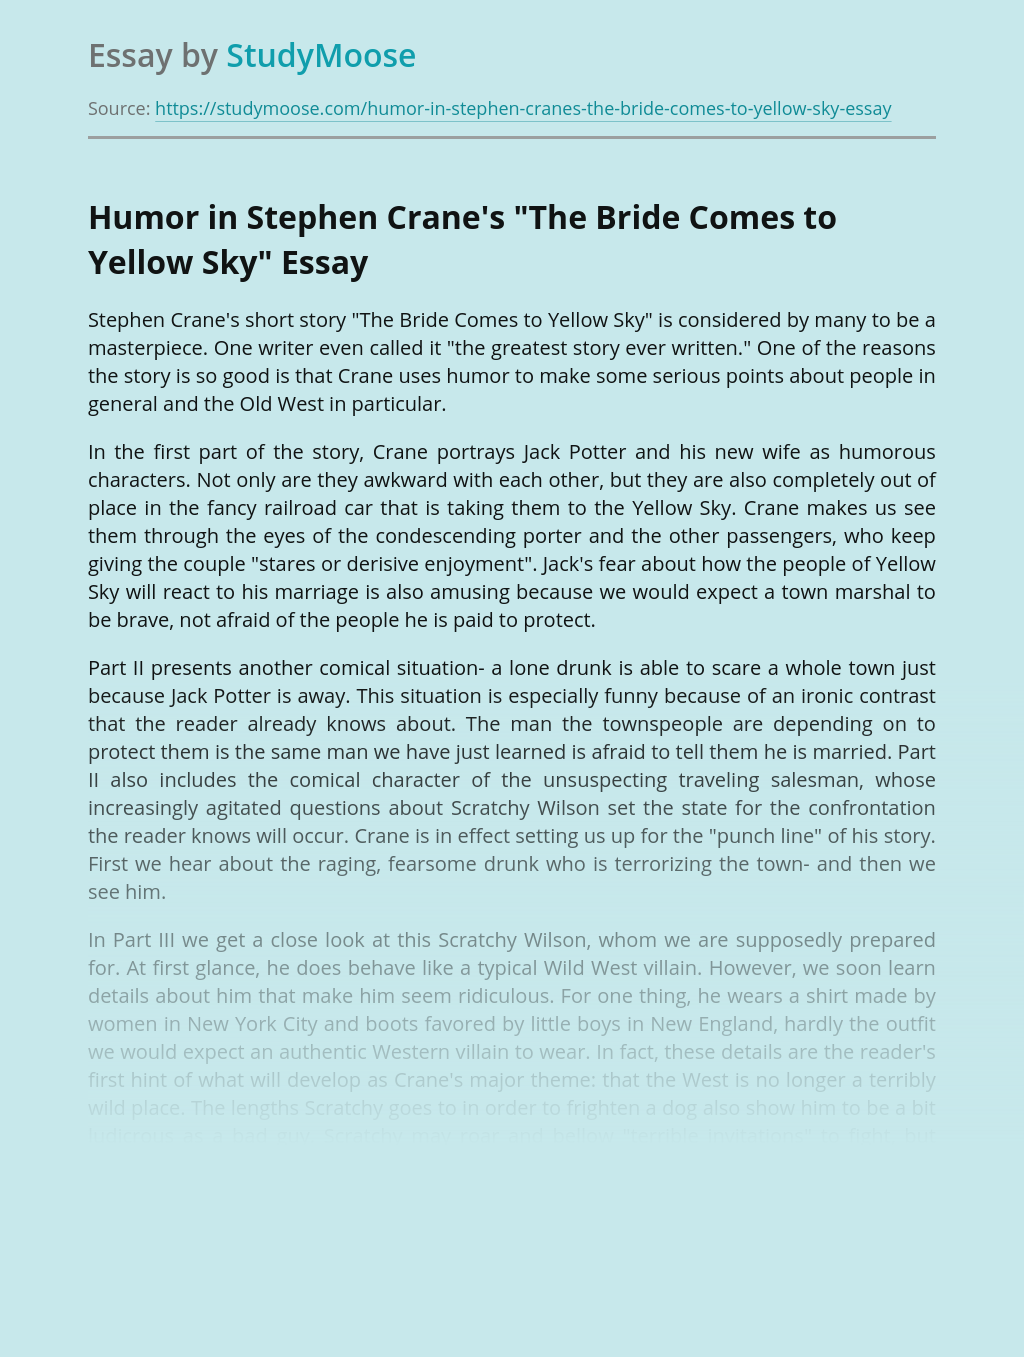 Humor in Stephen Crane's